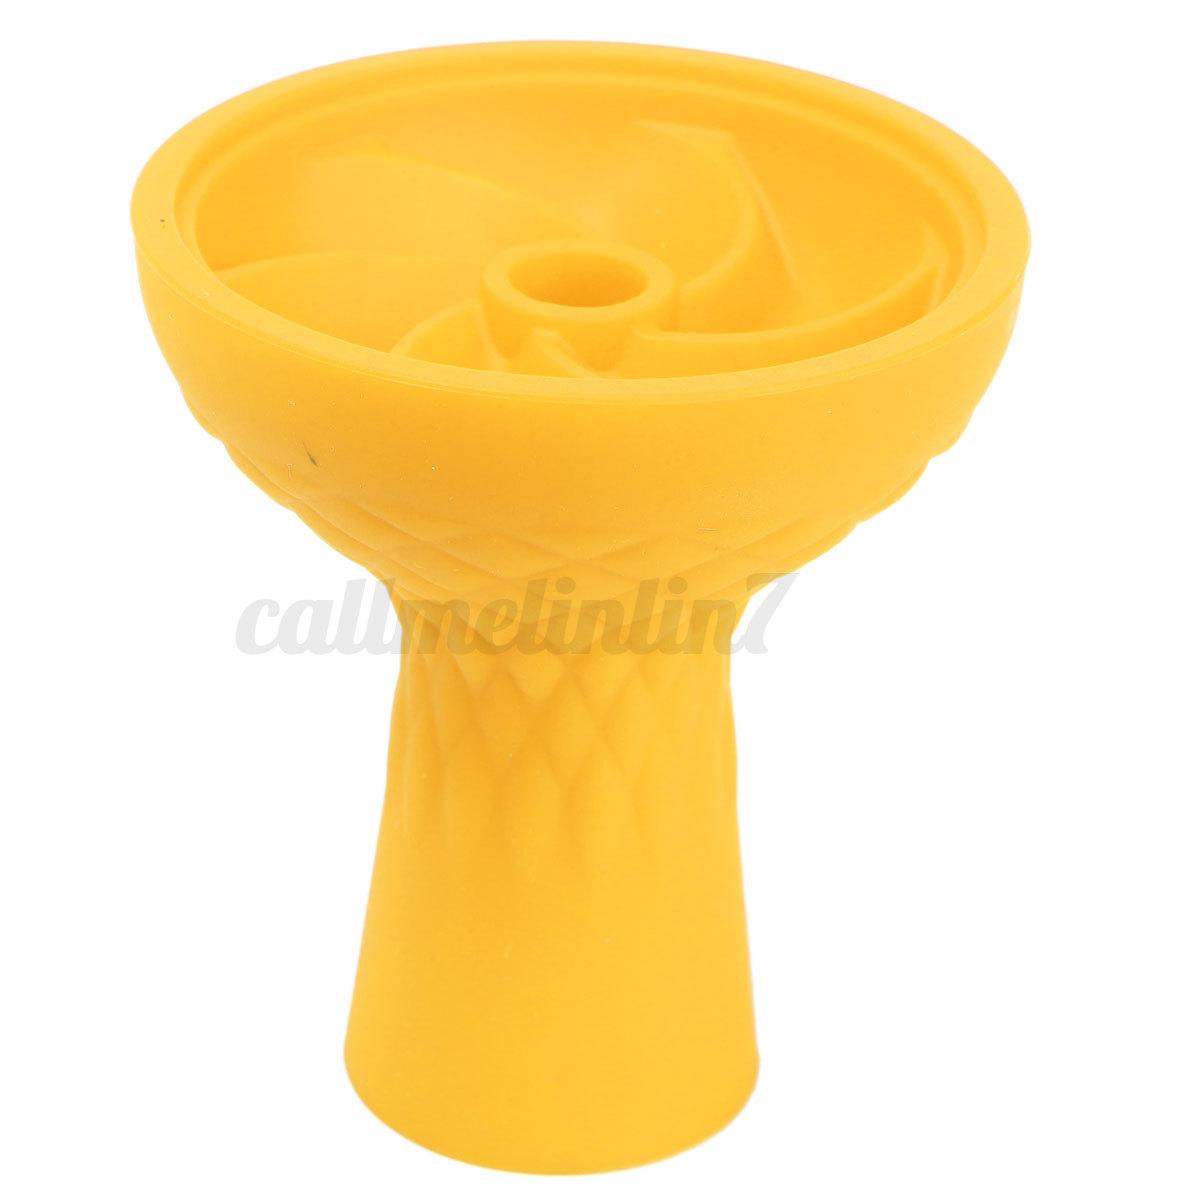 5 farben hitzebest ndiger shisha kopf silikon gummikopf. Black Bedroom Furniture Sets. Home Design Ideas